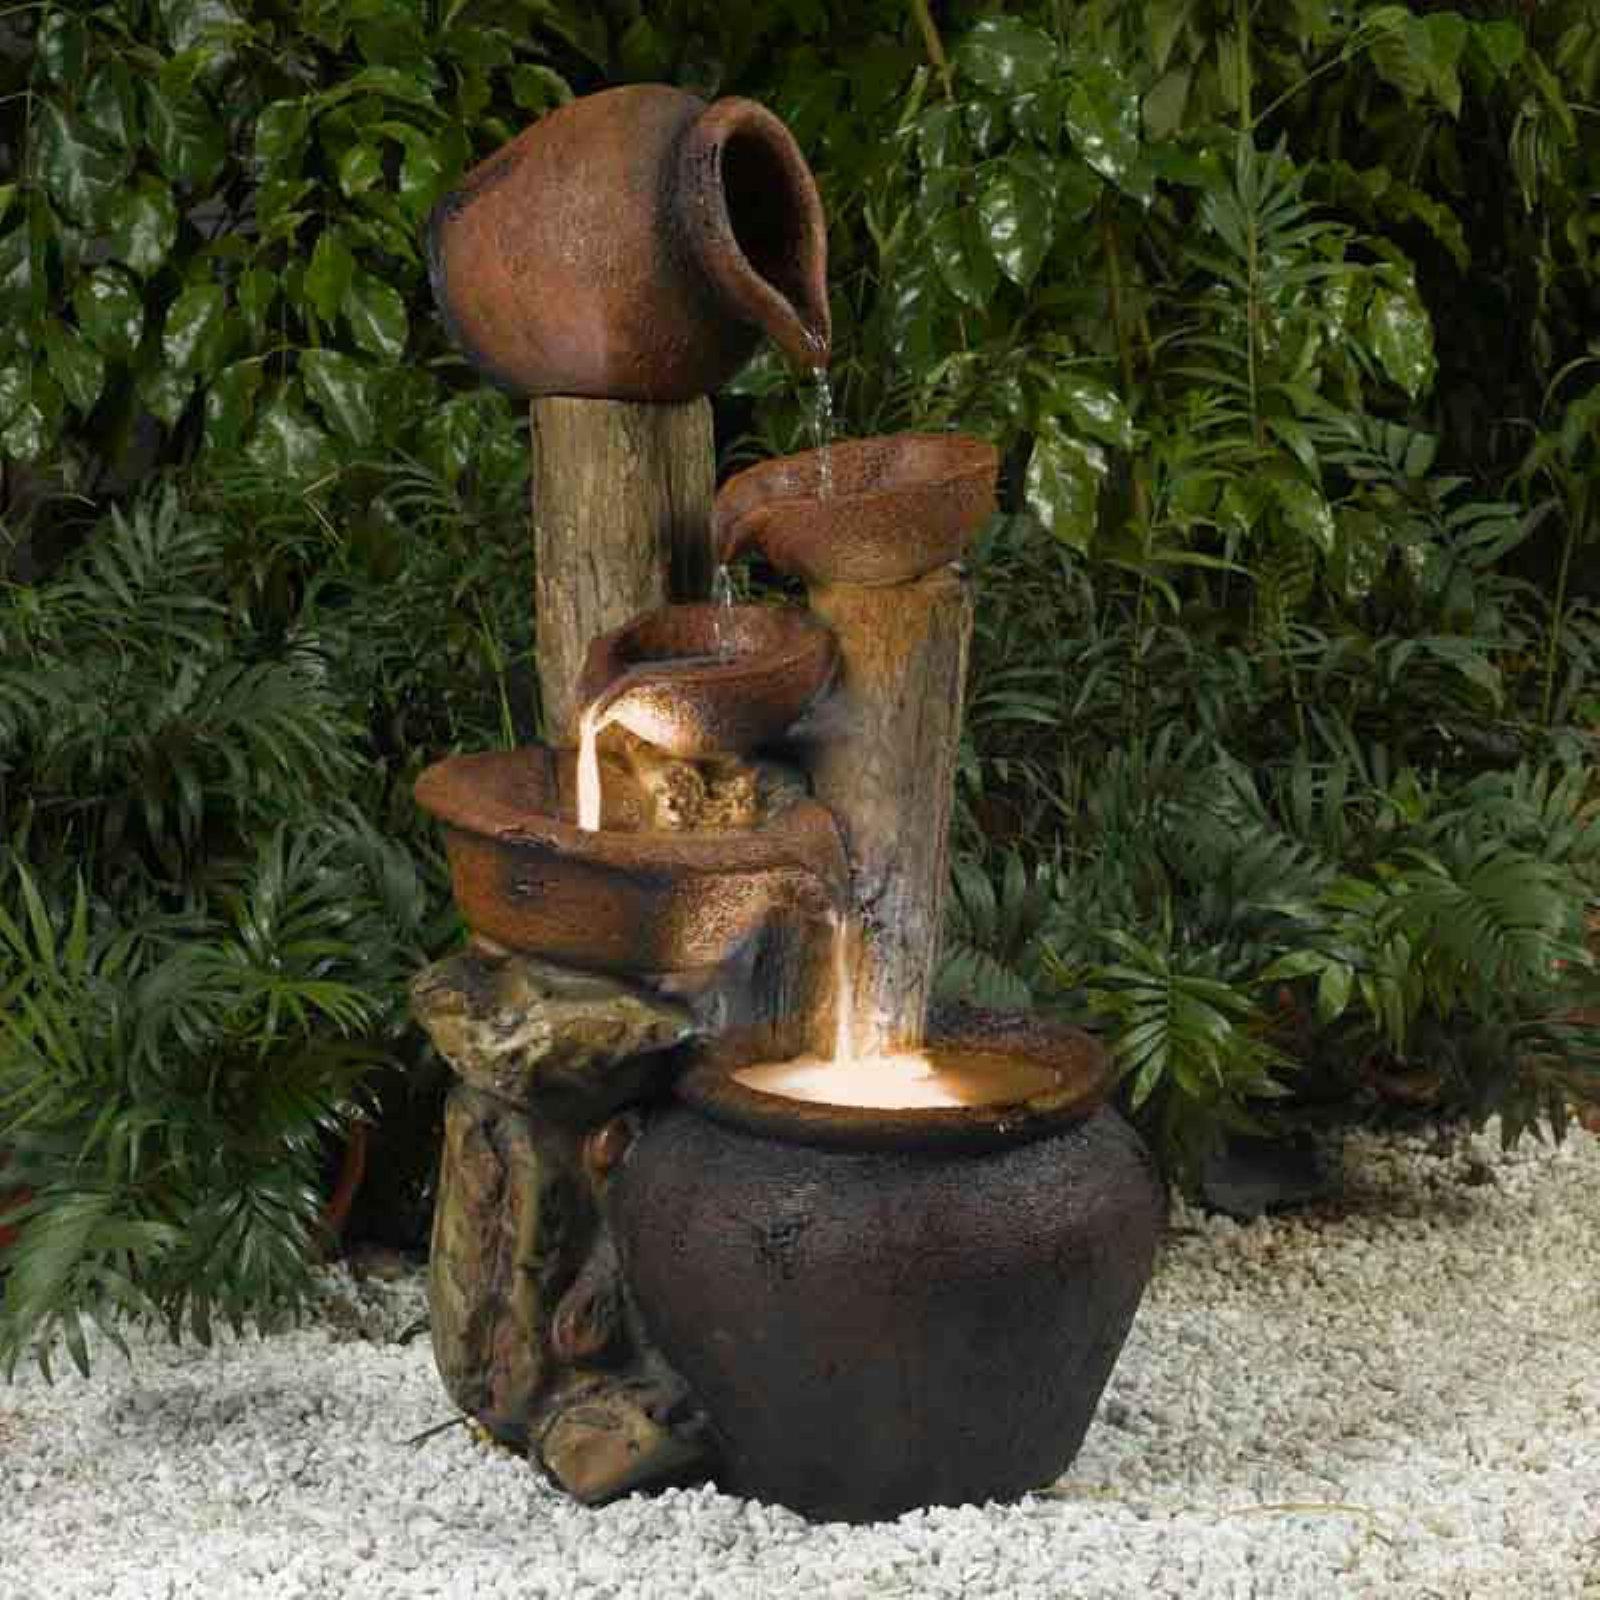 Jeco Pentole Pot Indoor Outdoor Fountain With Illumination